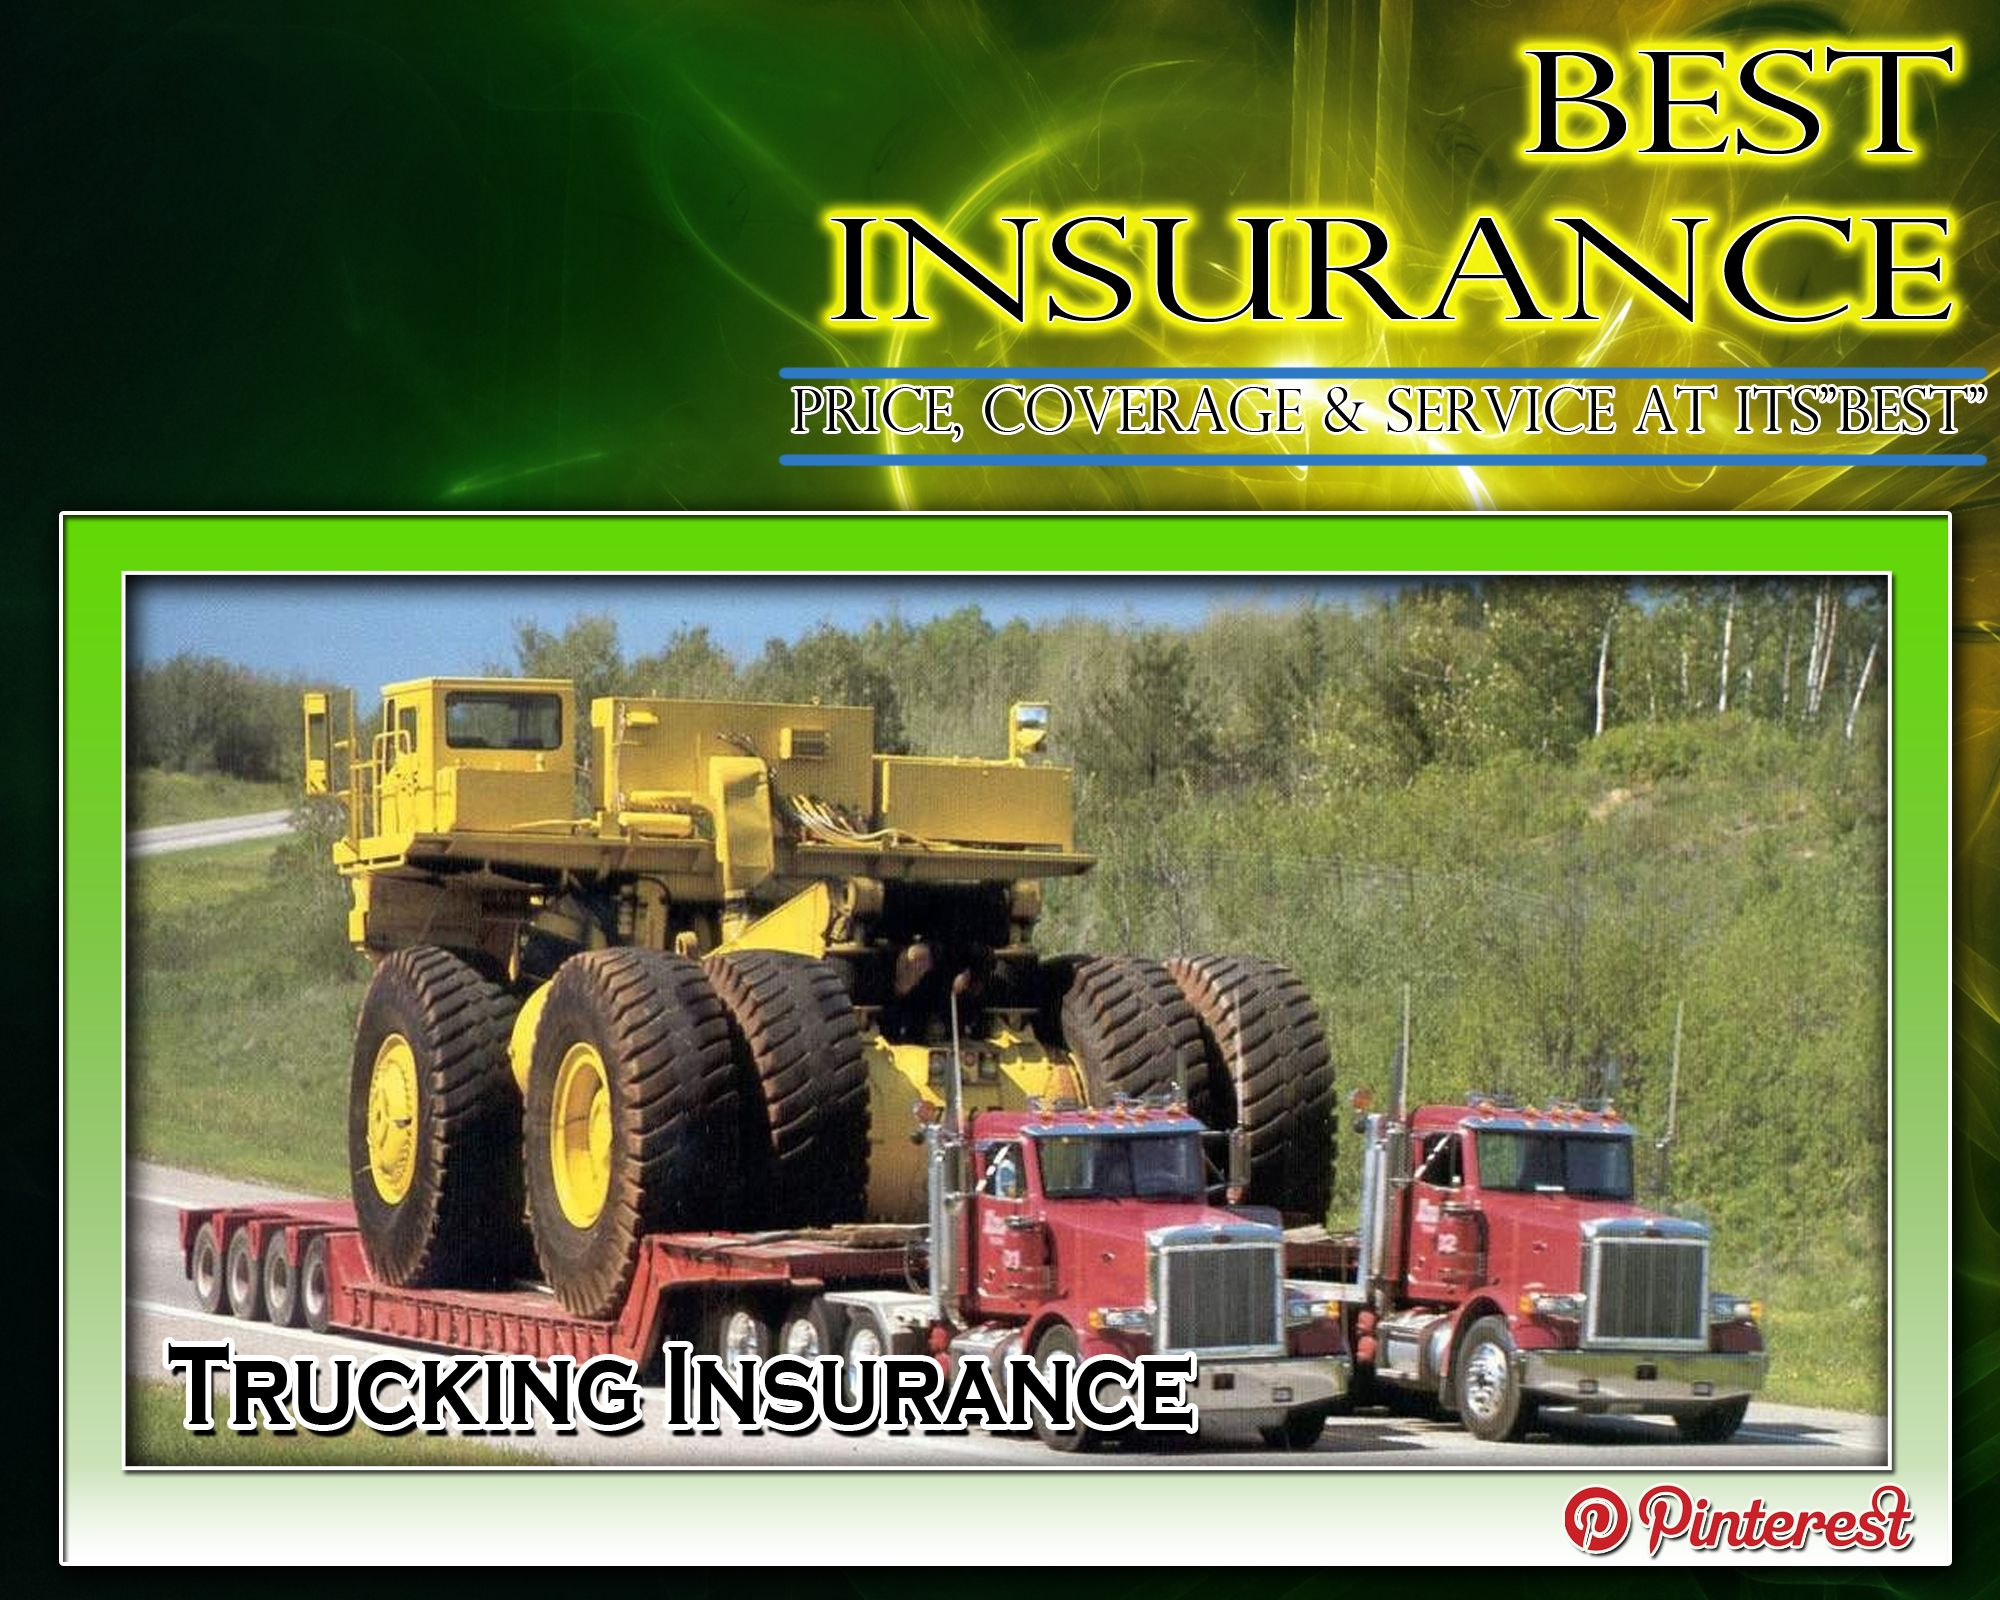 Autoinsuranceftlauderdale trucking insurance best